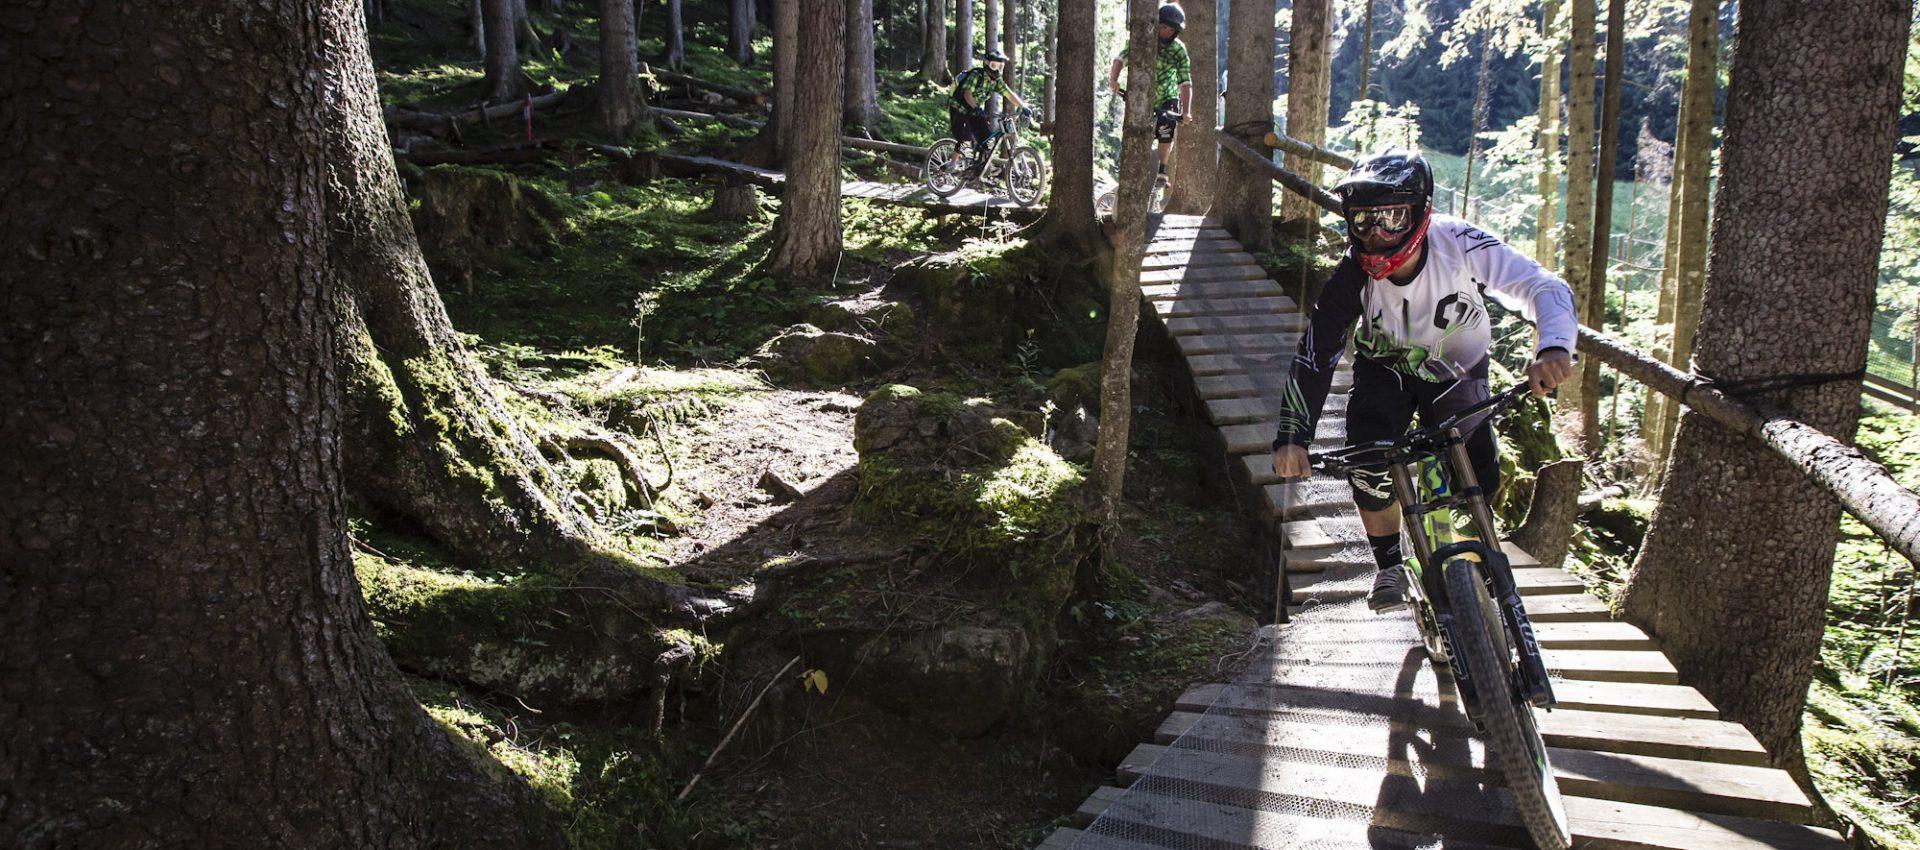 Mountainbike in voller Fahrt